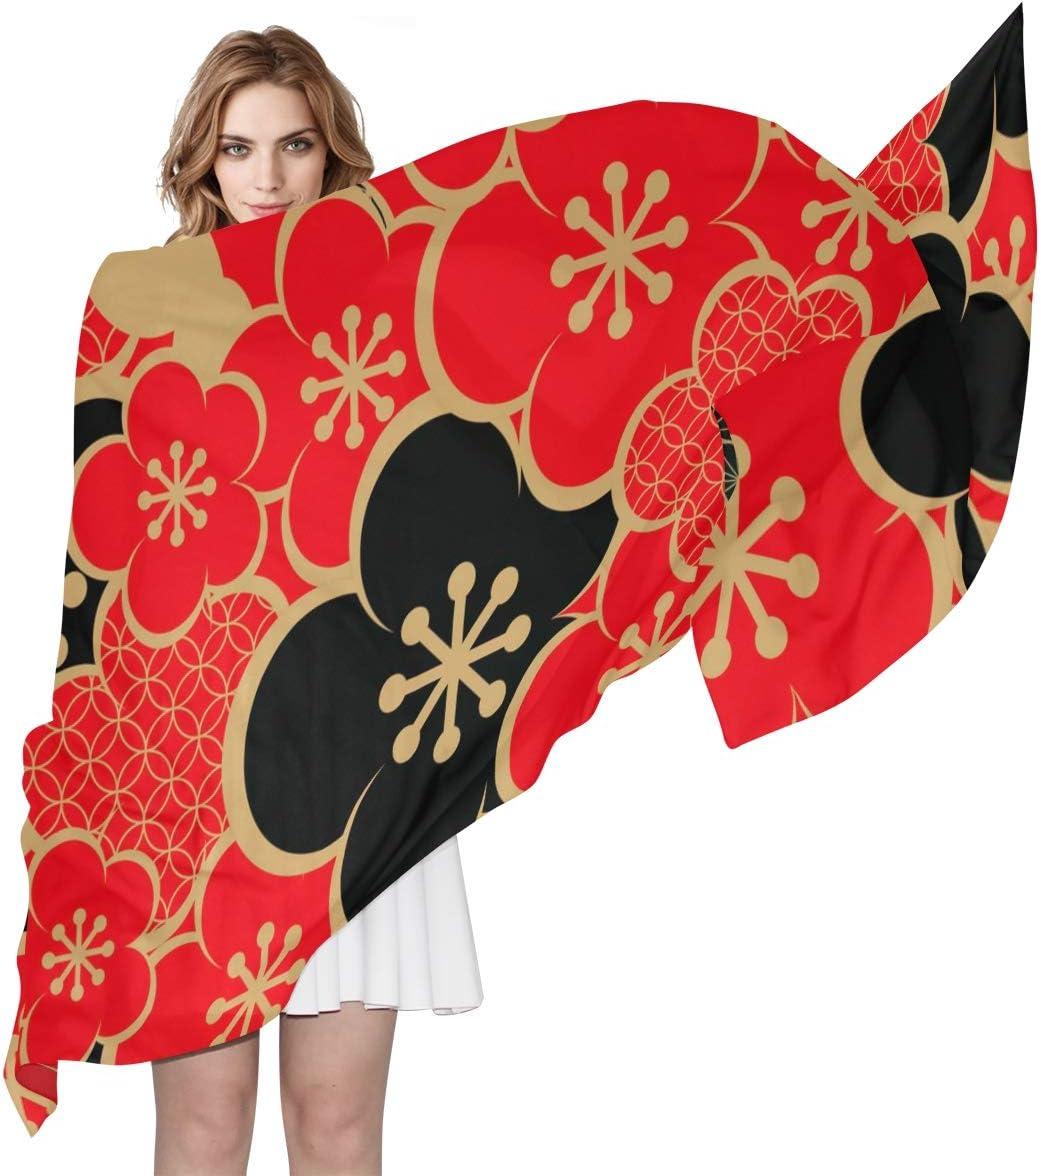 AUUXVA Fashion Scarf Japan Floral Cherry Blossom Pattern Long Lightweight Sunscreen Scarf Shawl Wrap Muffler Neckerchief for Women Men